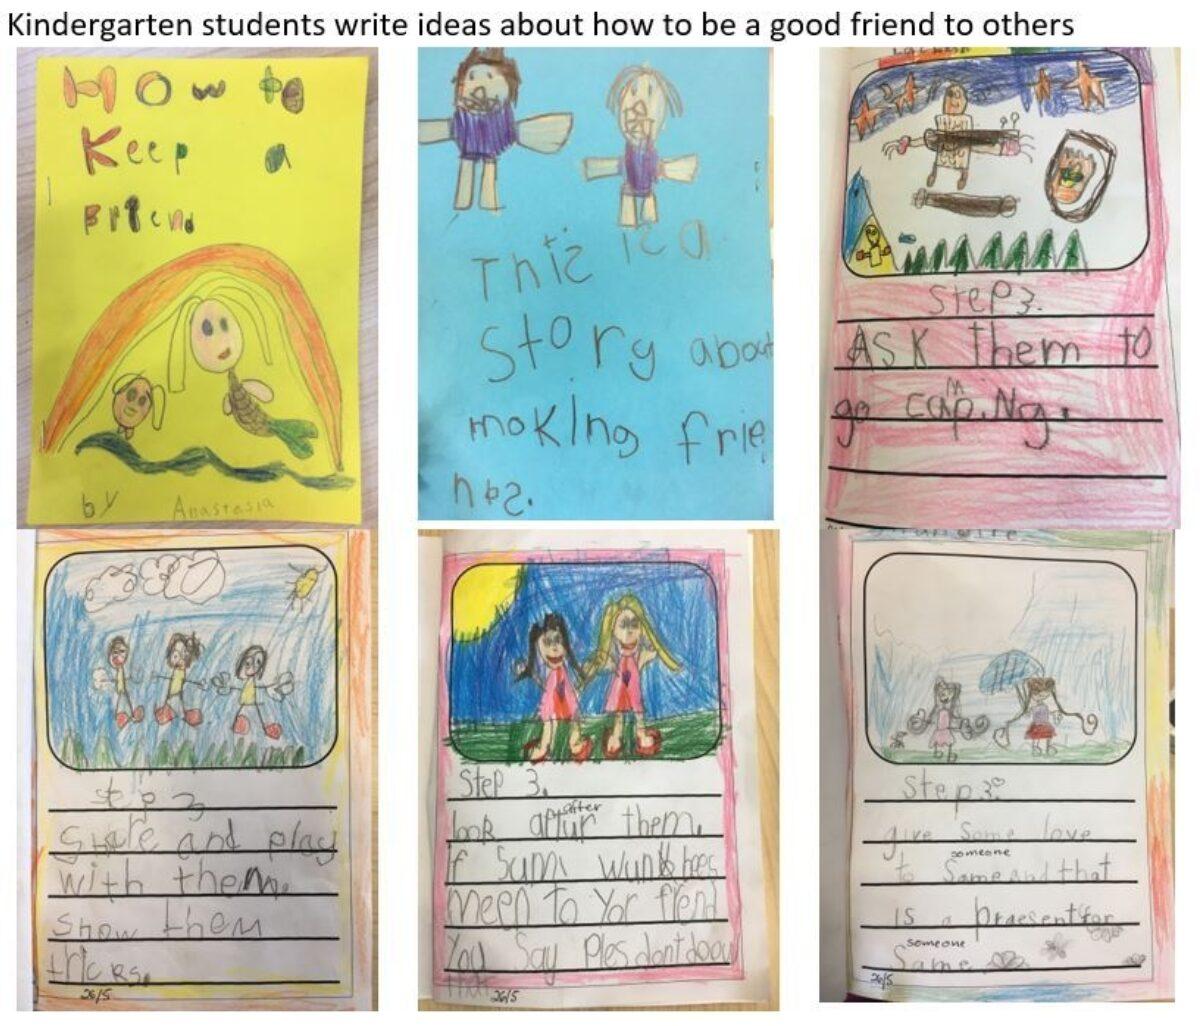 Kindy students' writing